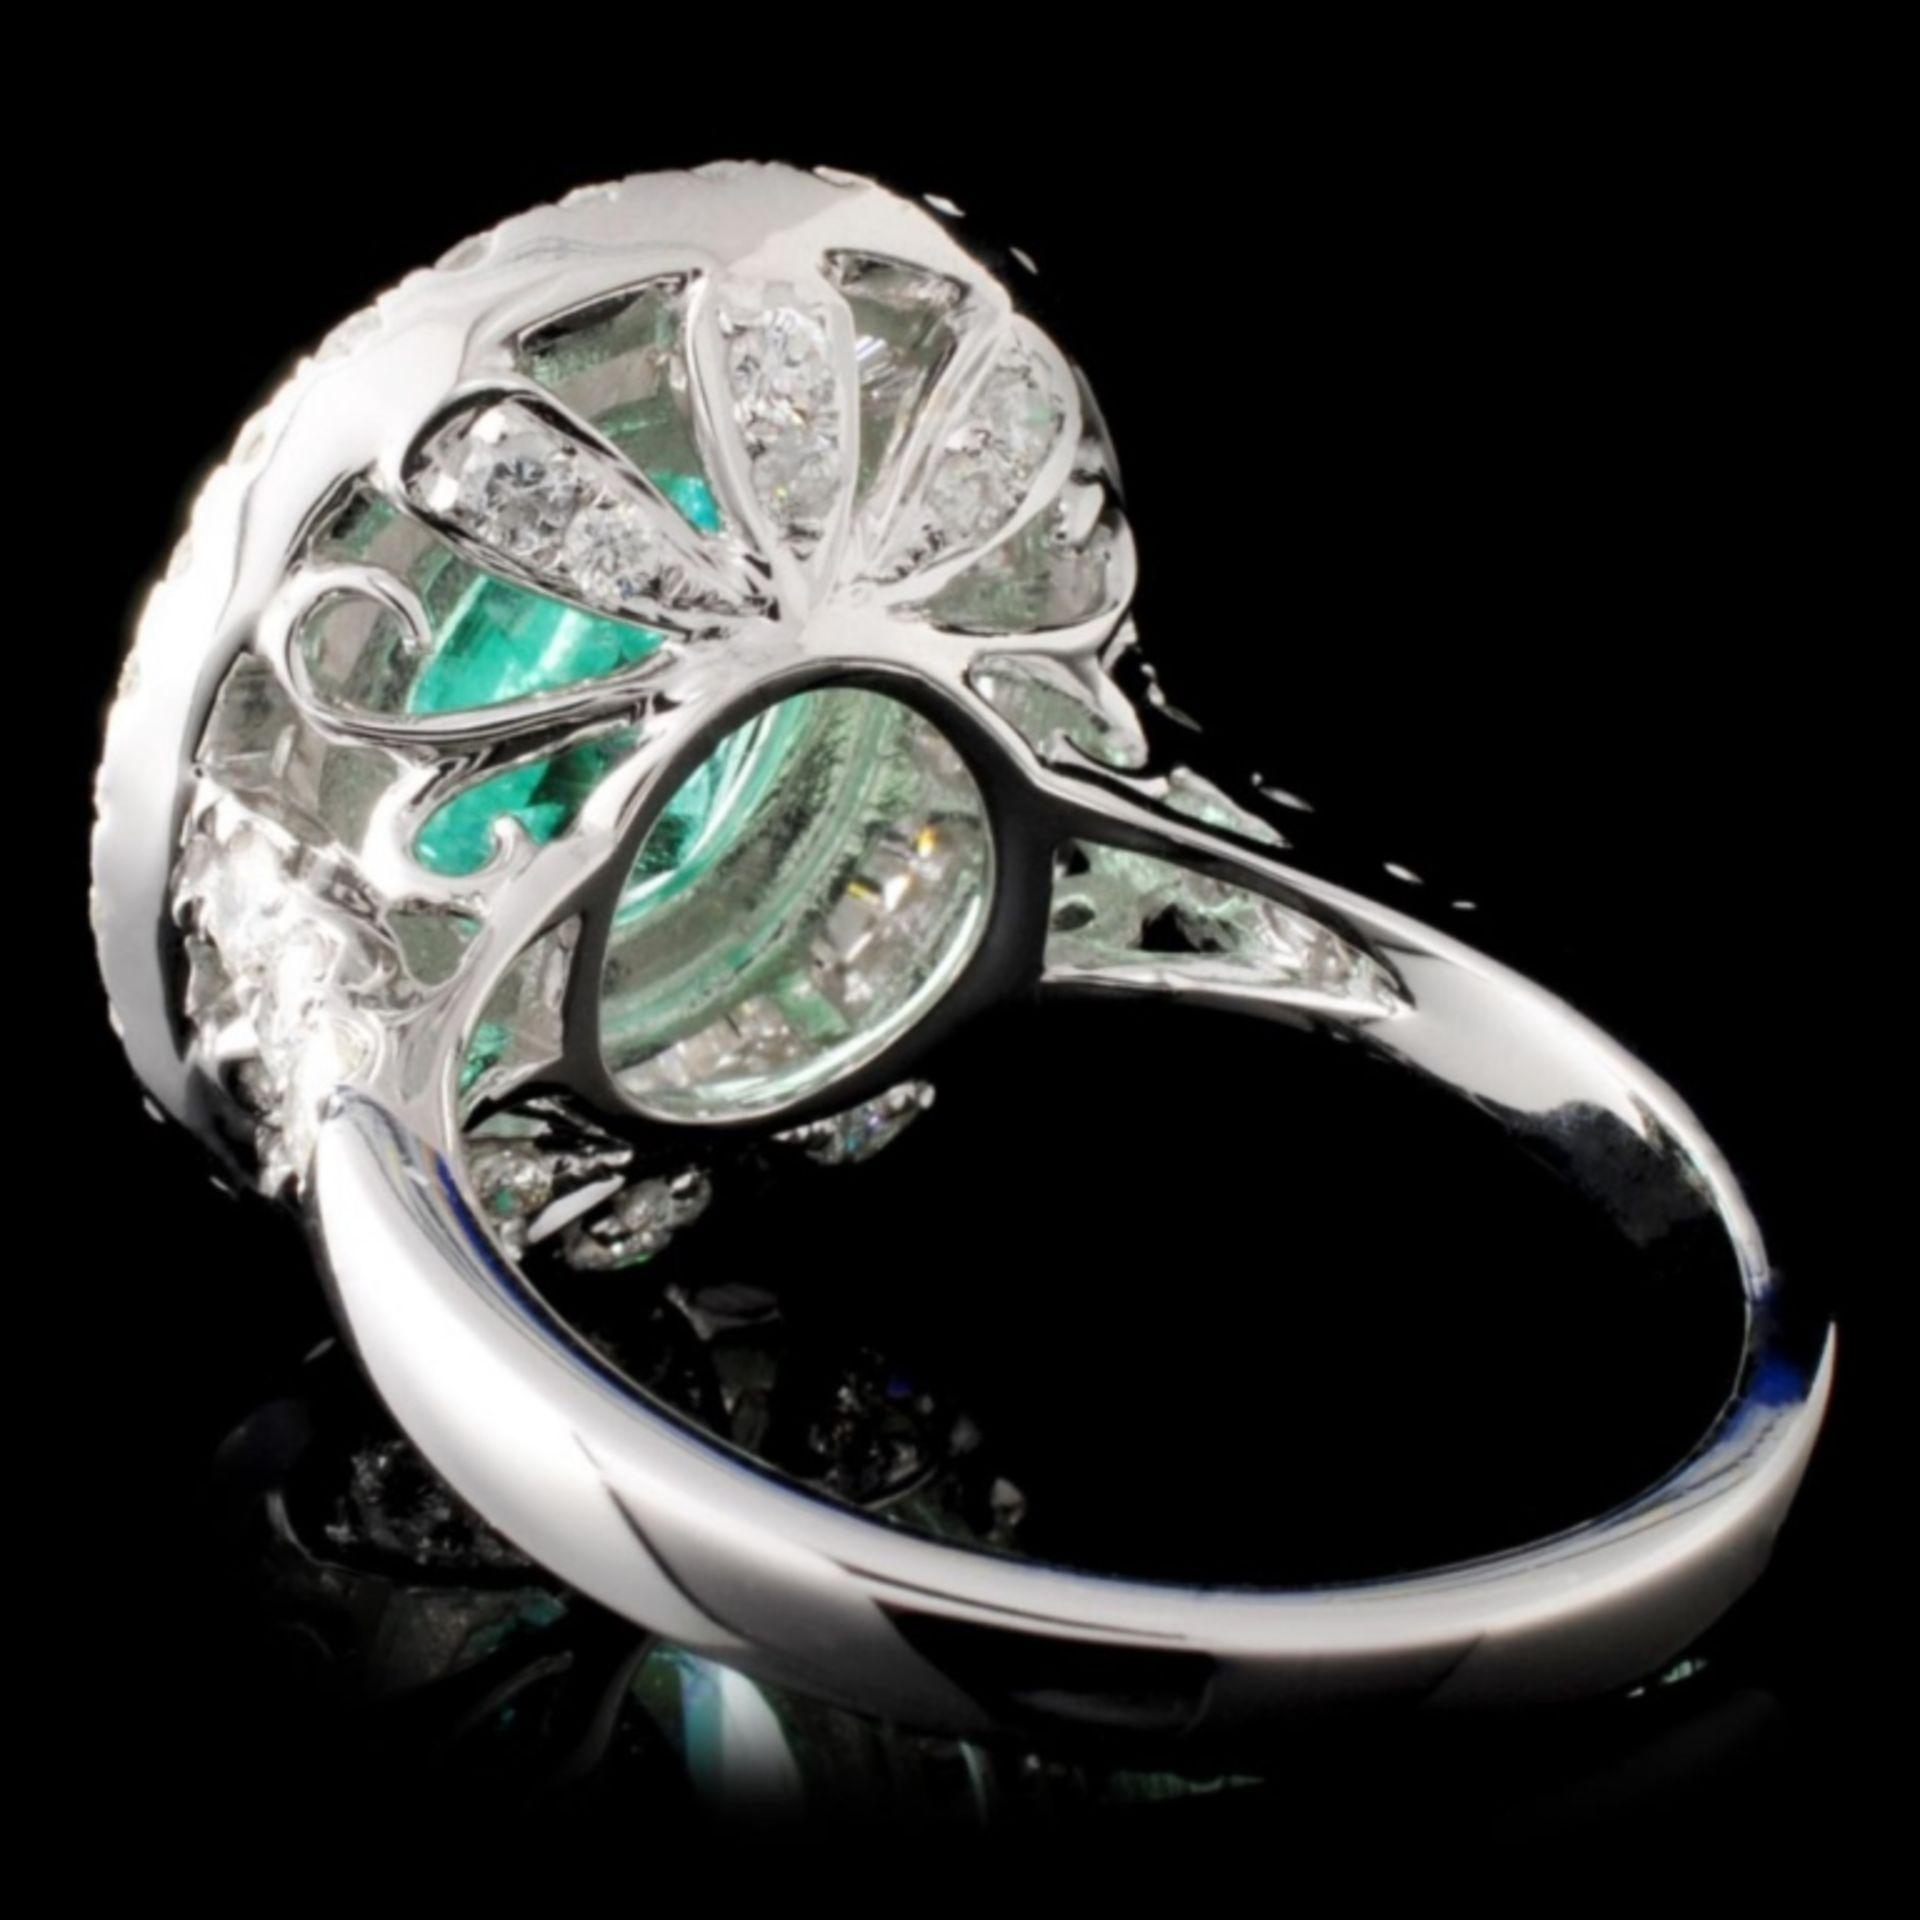 18K Gold 2.50ct Emerald & 1.79ctw Diamond Ring - Image 3 of 4